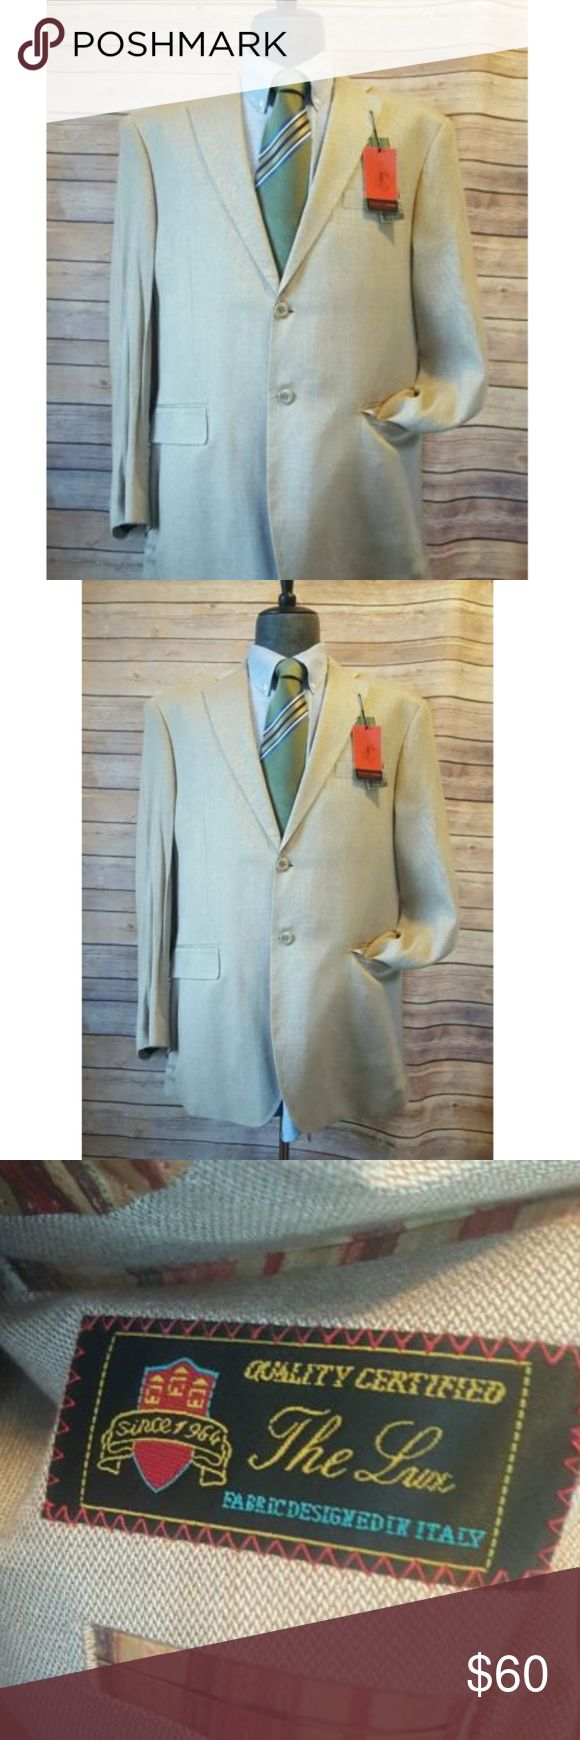 Pronto Moda Elite NWT Mens 42R Light Brown Blazer New with tags Pronto Moda Mens Blazer    Item Description:  Pronto Moda Elite Blazer, NWT condition, measurements are in the photos             Brand: Pronto Moda   Color: Light brown  Pattern: Solid Pronto Moda Elite Suits & Blazers Sport Coats & Blazers